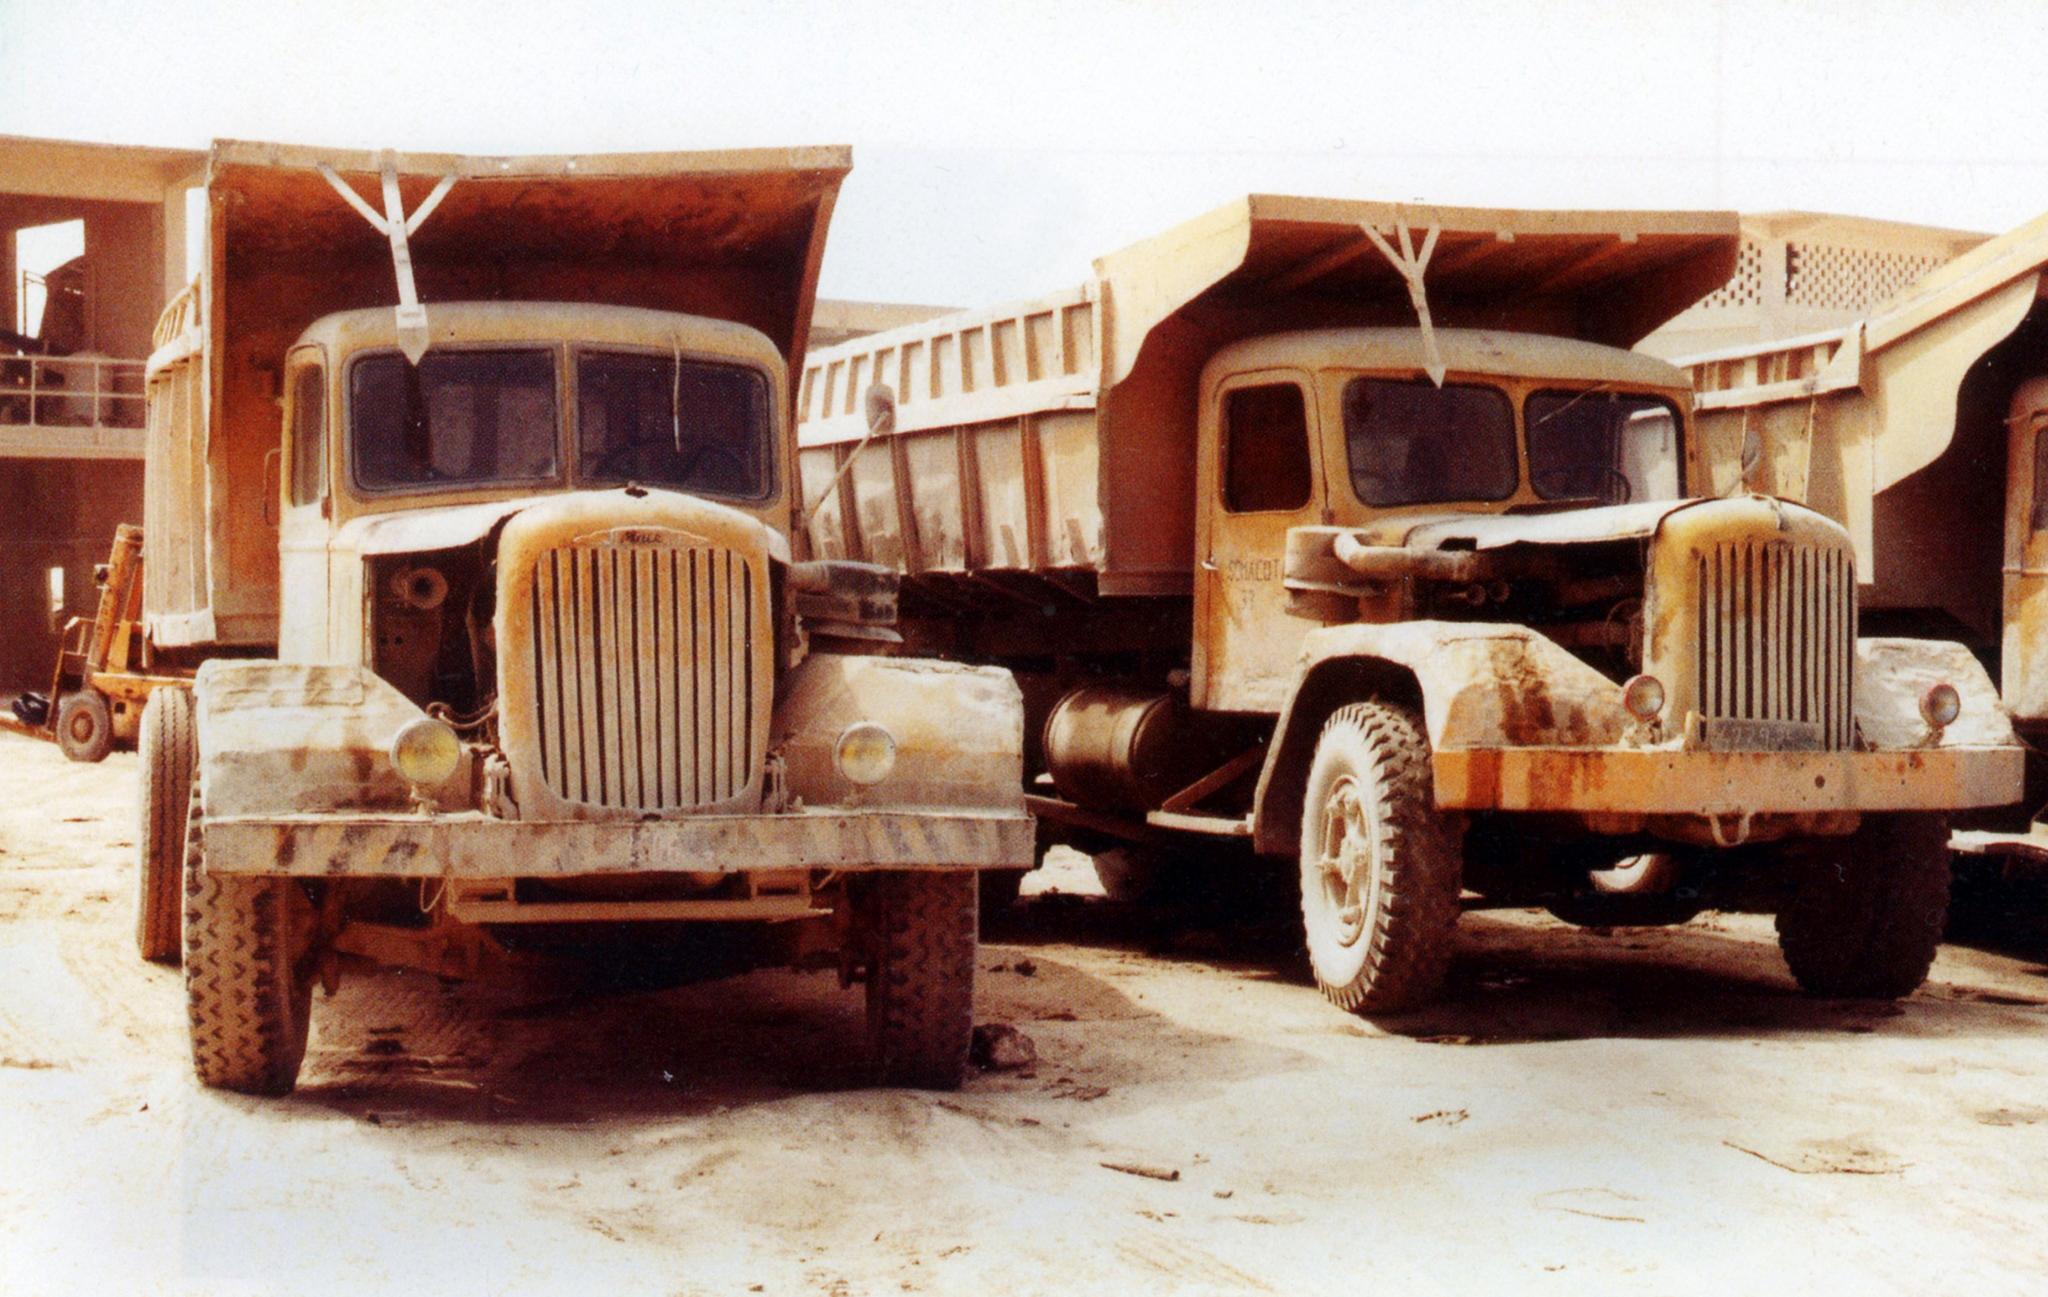 Transport Routier au Maroc - Histoire - Page 2 49880790987_37425f1ae8_o_d